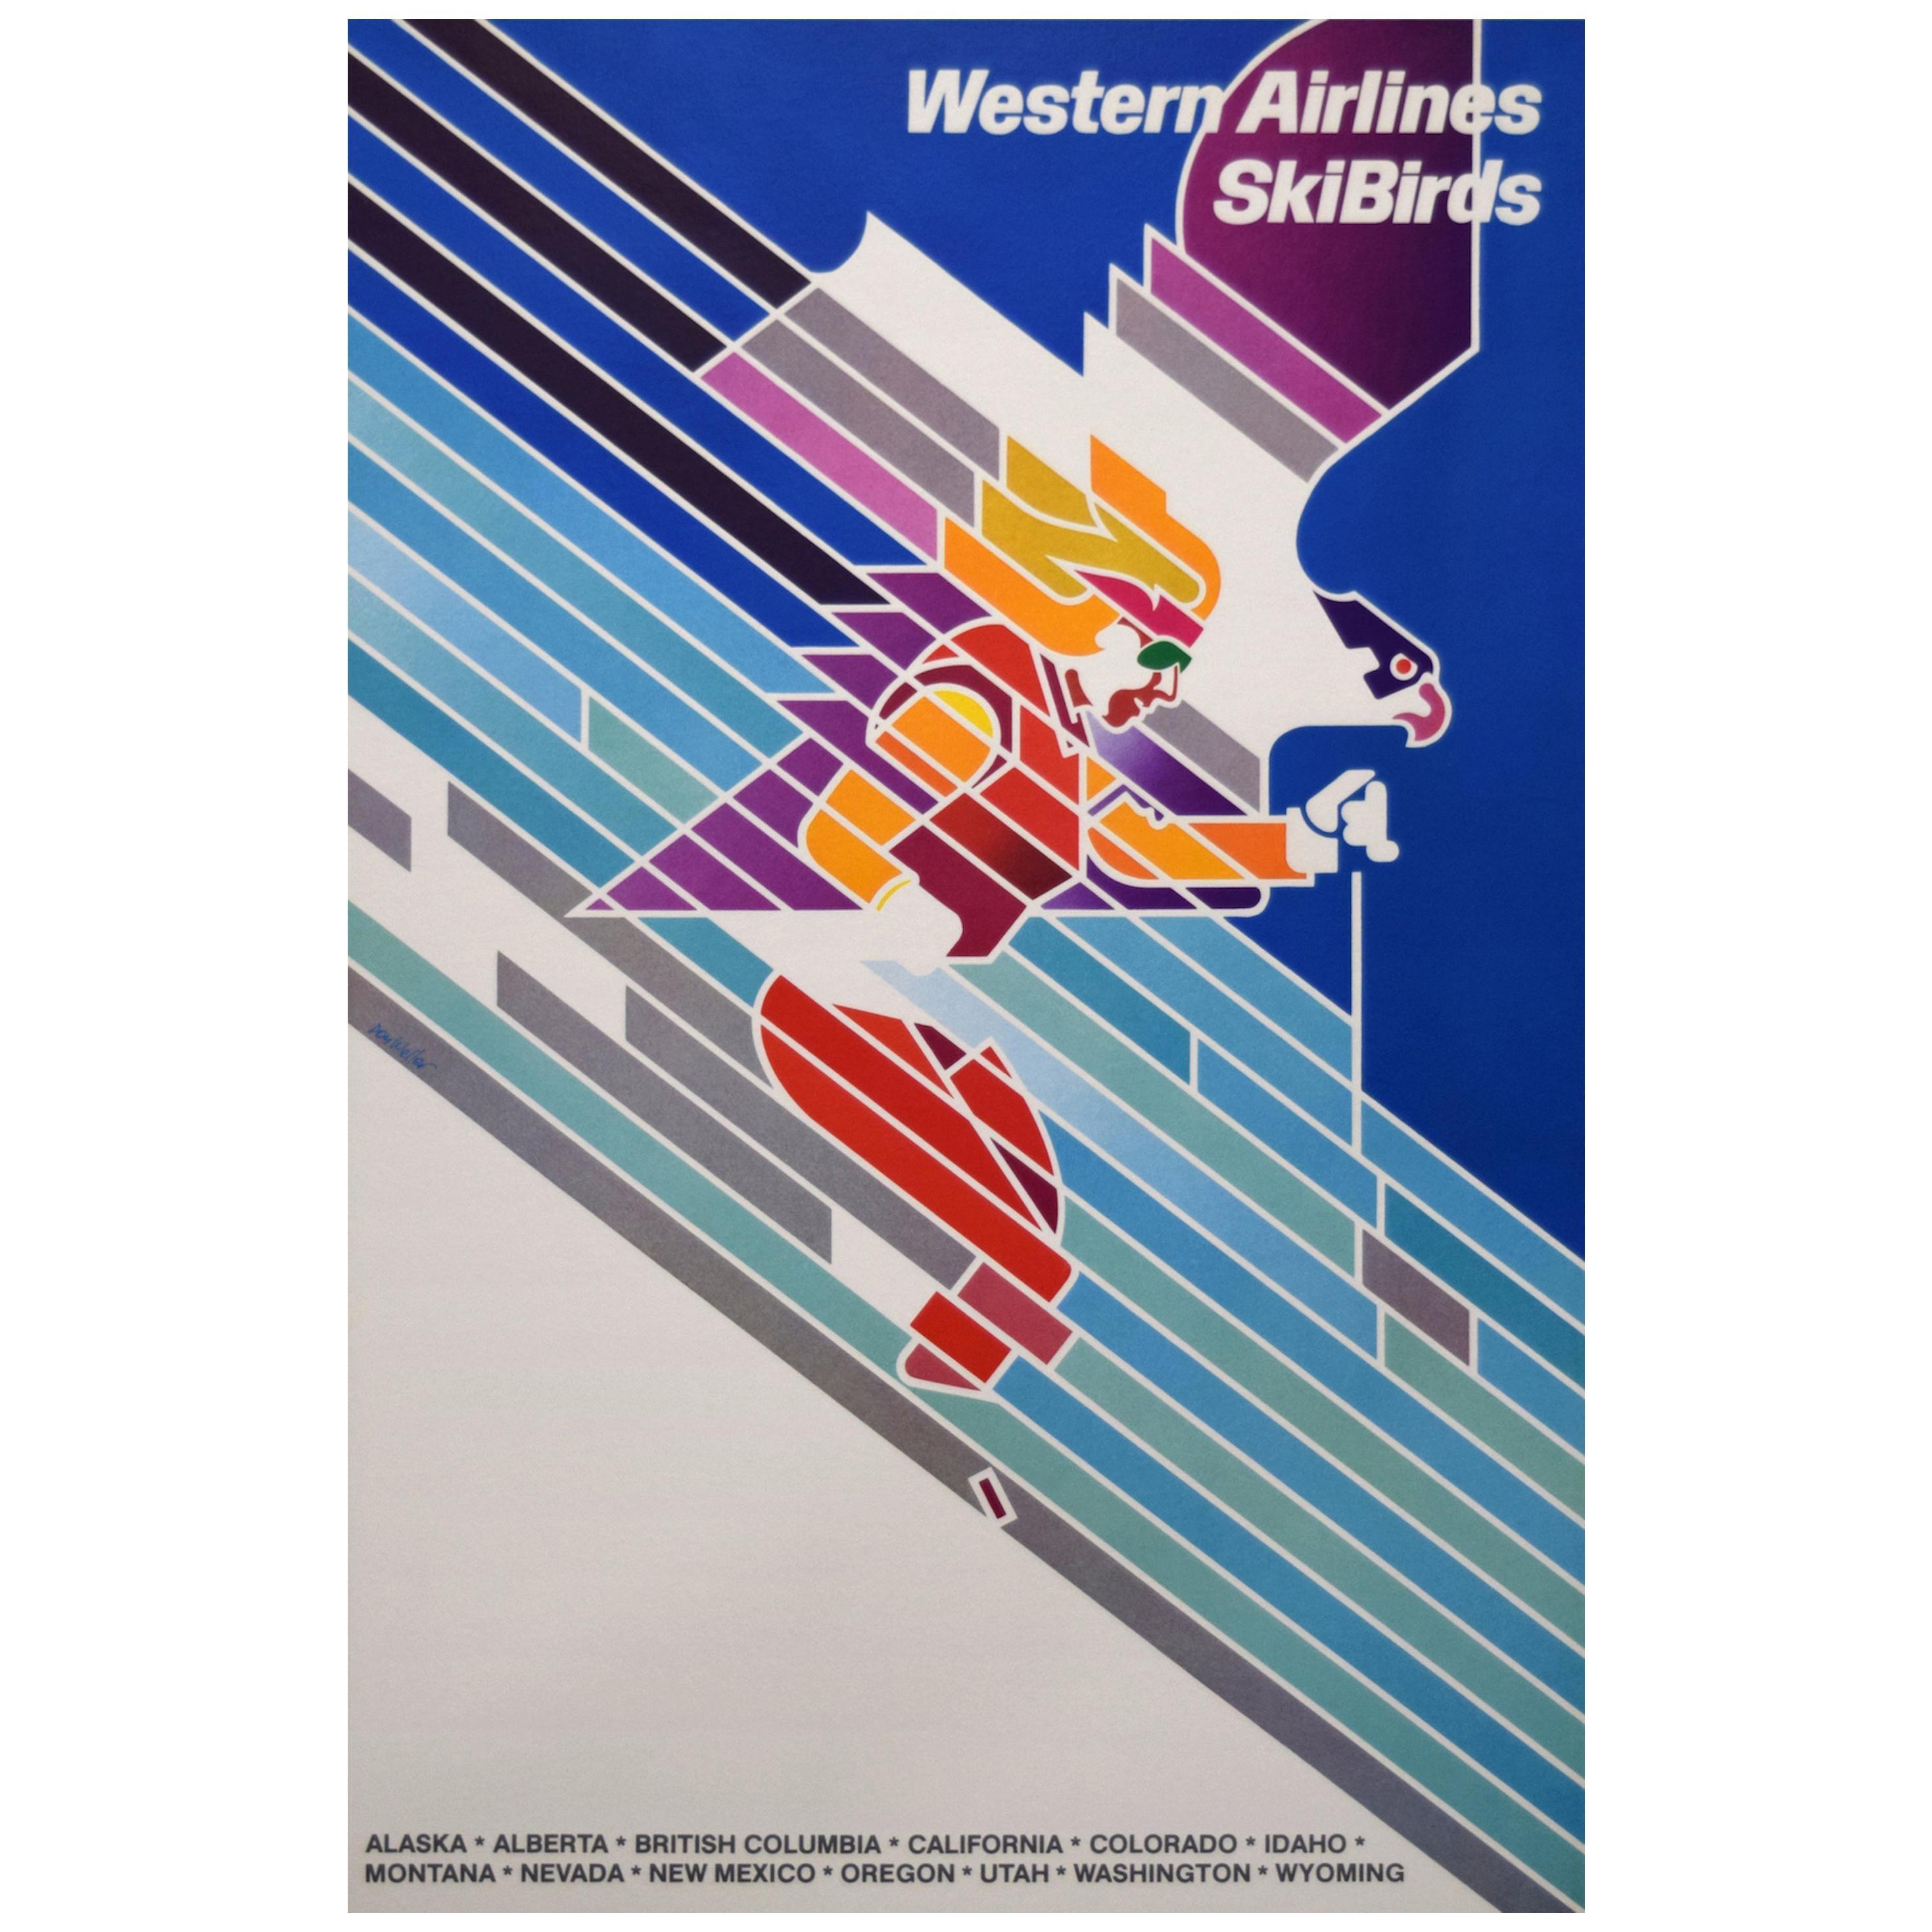 Western Airlines 1970s SkiBirds Poster, Weller